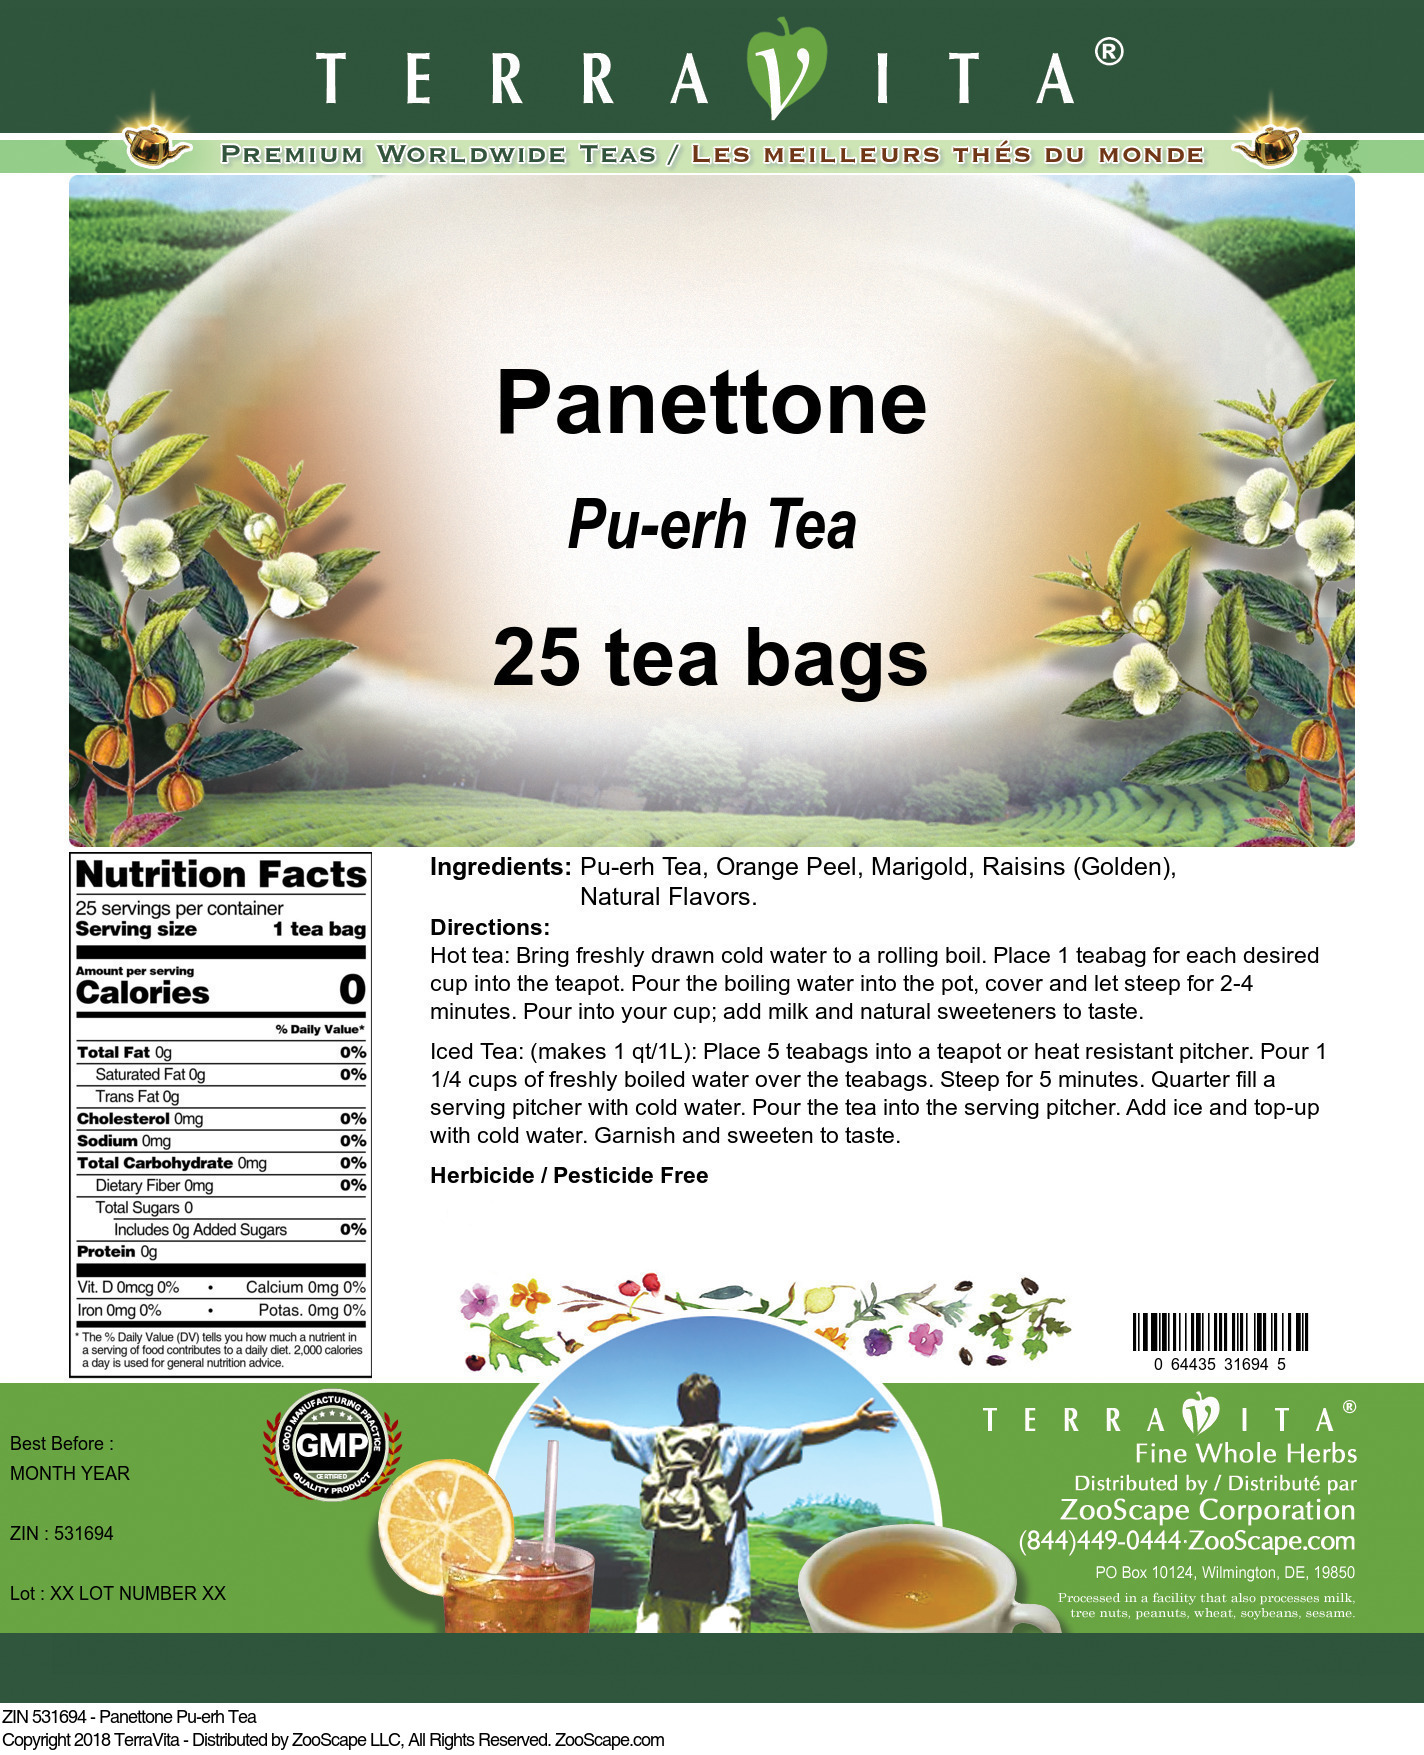 Panettone Pu-erh Tea